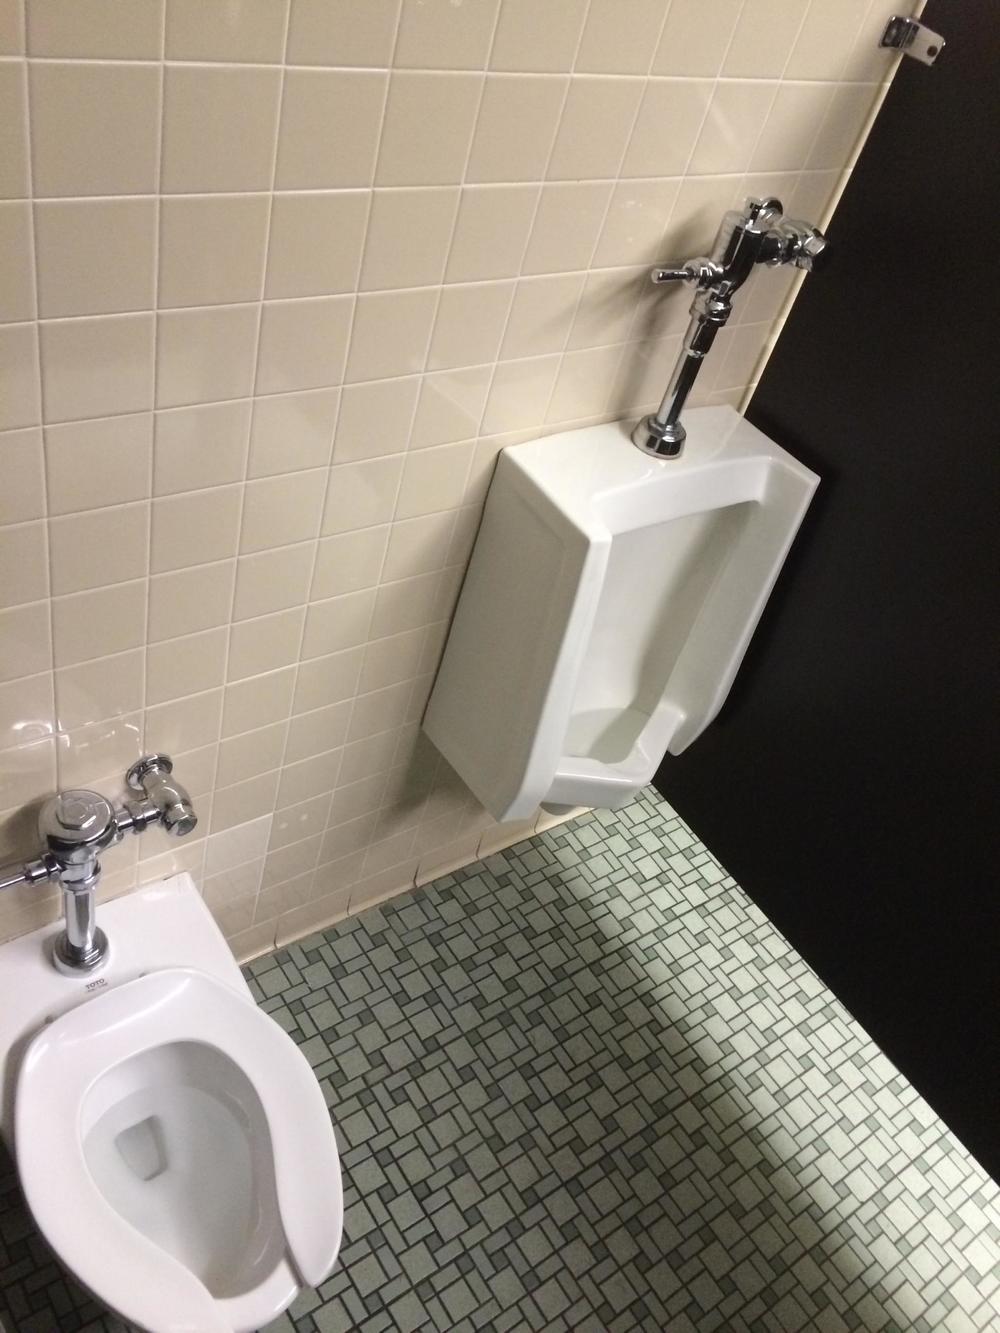 The bathroom stalllin question.